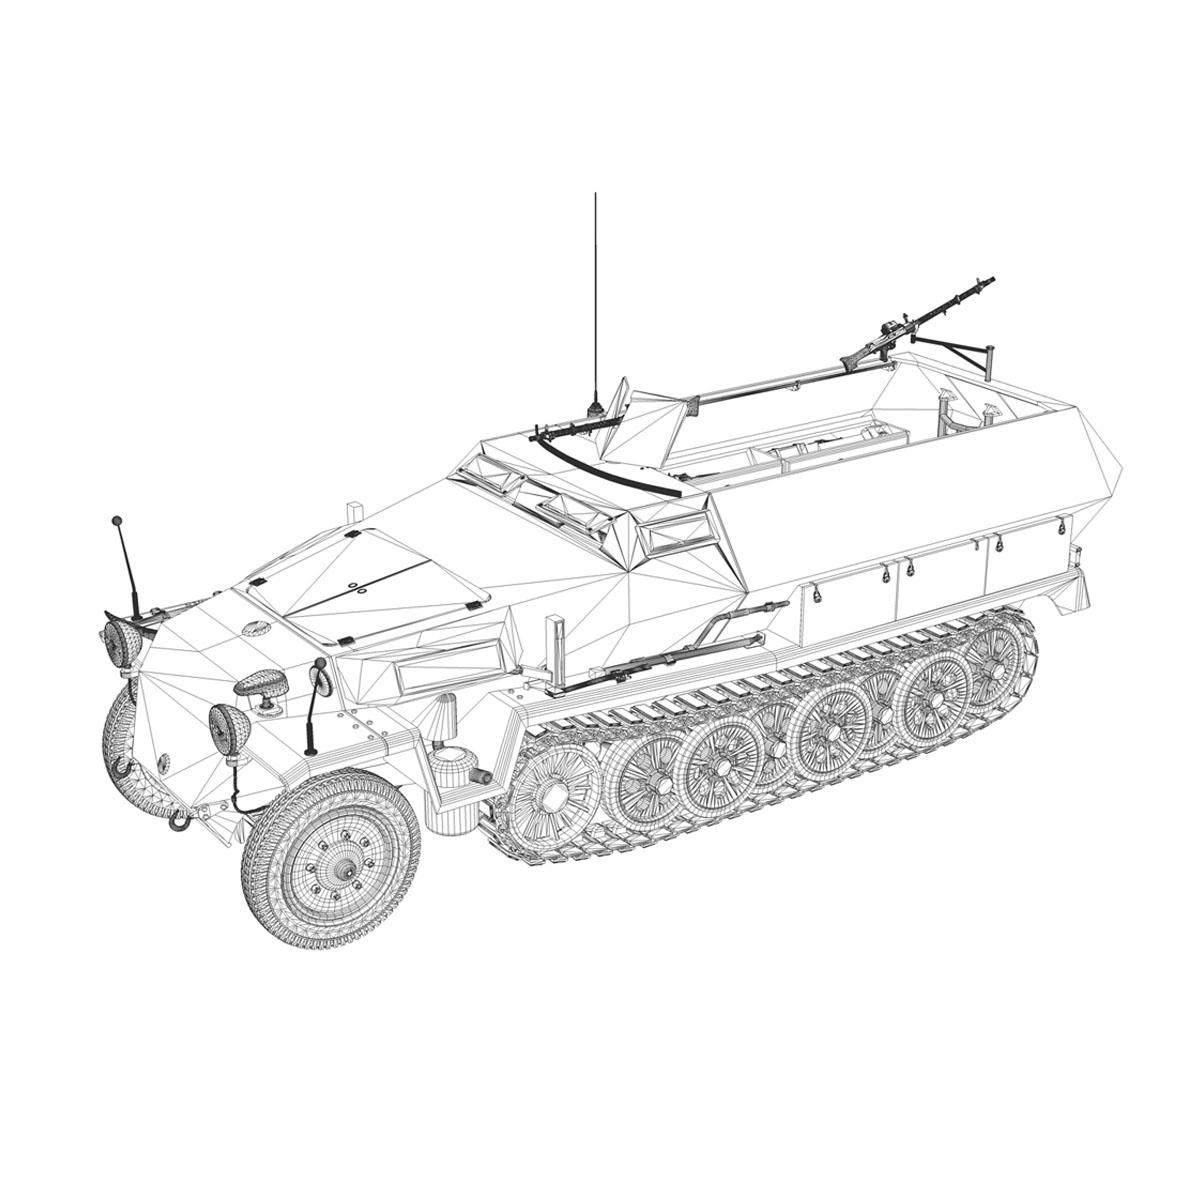 sd.kfz 251 1 ausf.c – half-track 3d model 3ds fbx c4d lwo obj 201399